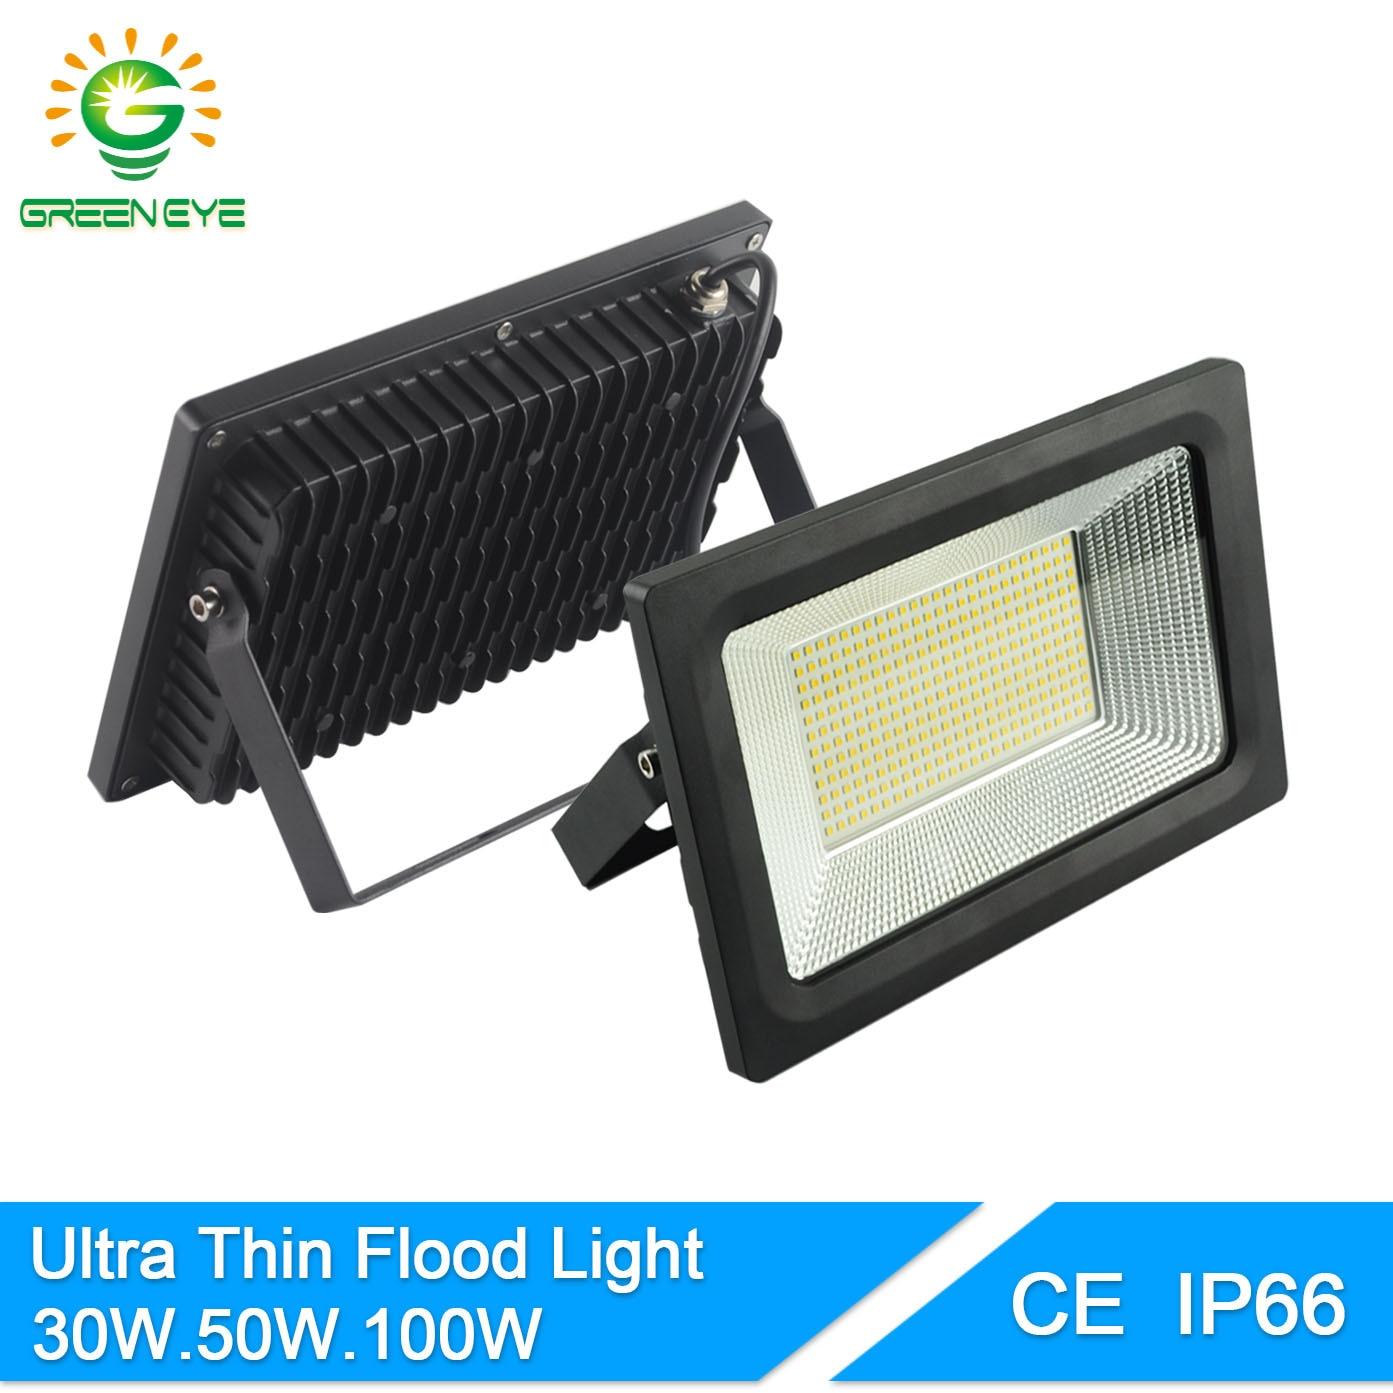 greeneye ip66 waterproof ultra thin 185 240v led floodlight 30w 50w 100w spot led 220v flood. Black Bedroom Furniture Sets. Home Design Ideas